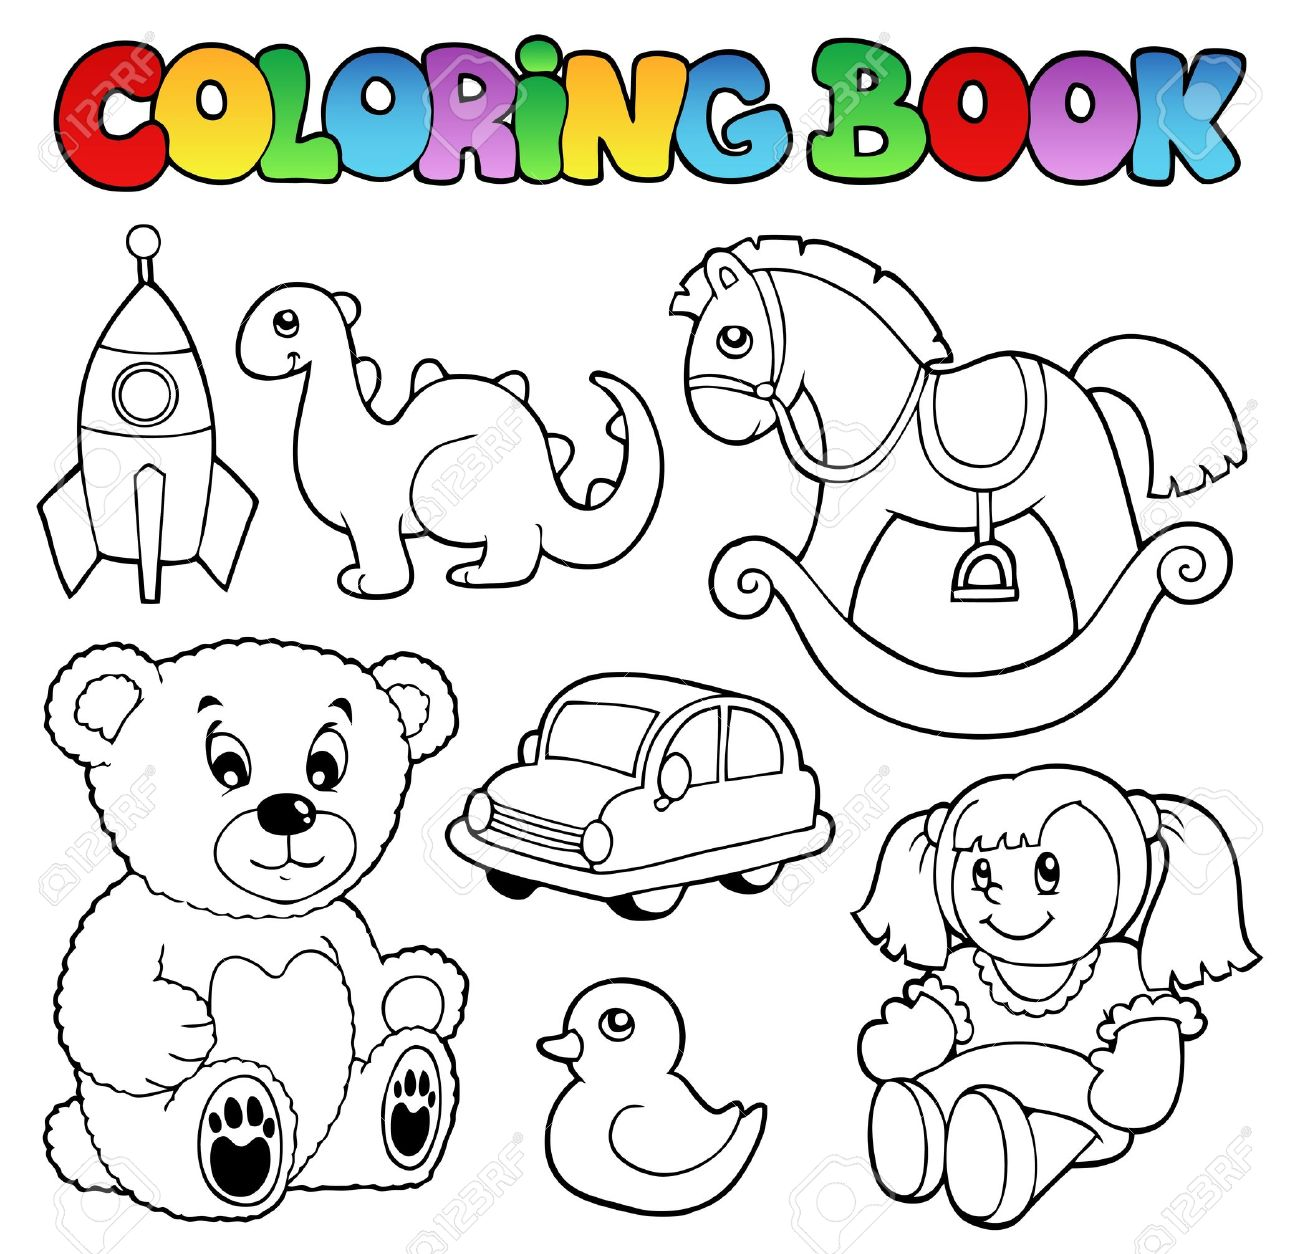 Encantador Historia De Juguete Para Colorear Inspiración - Enmarcado ...